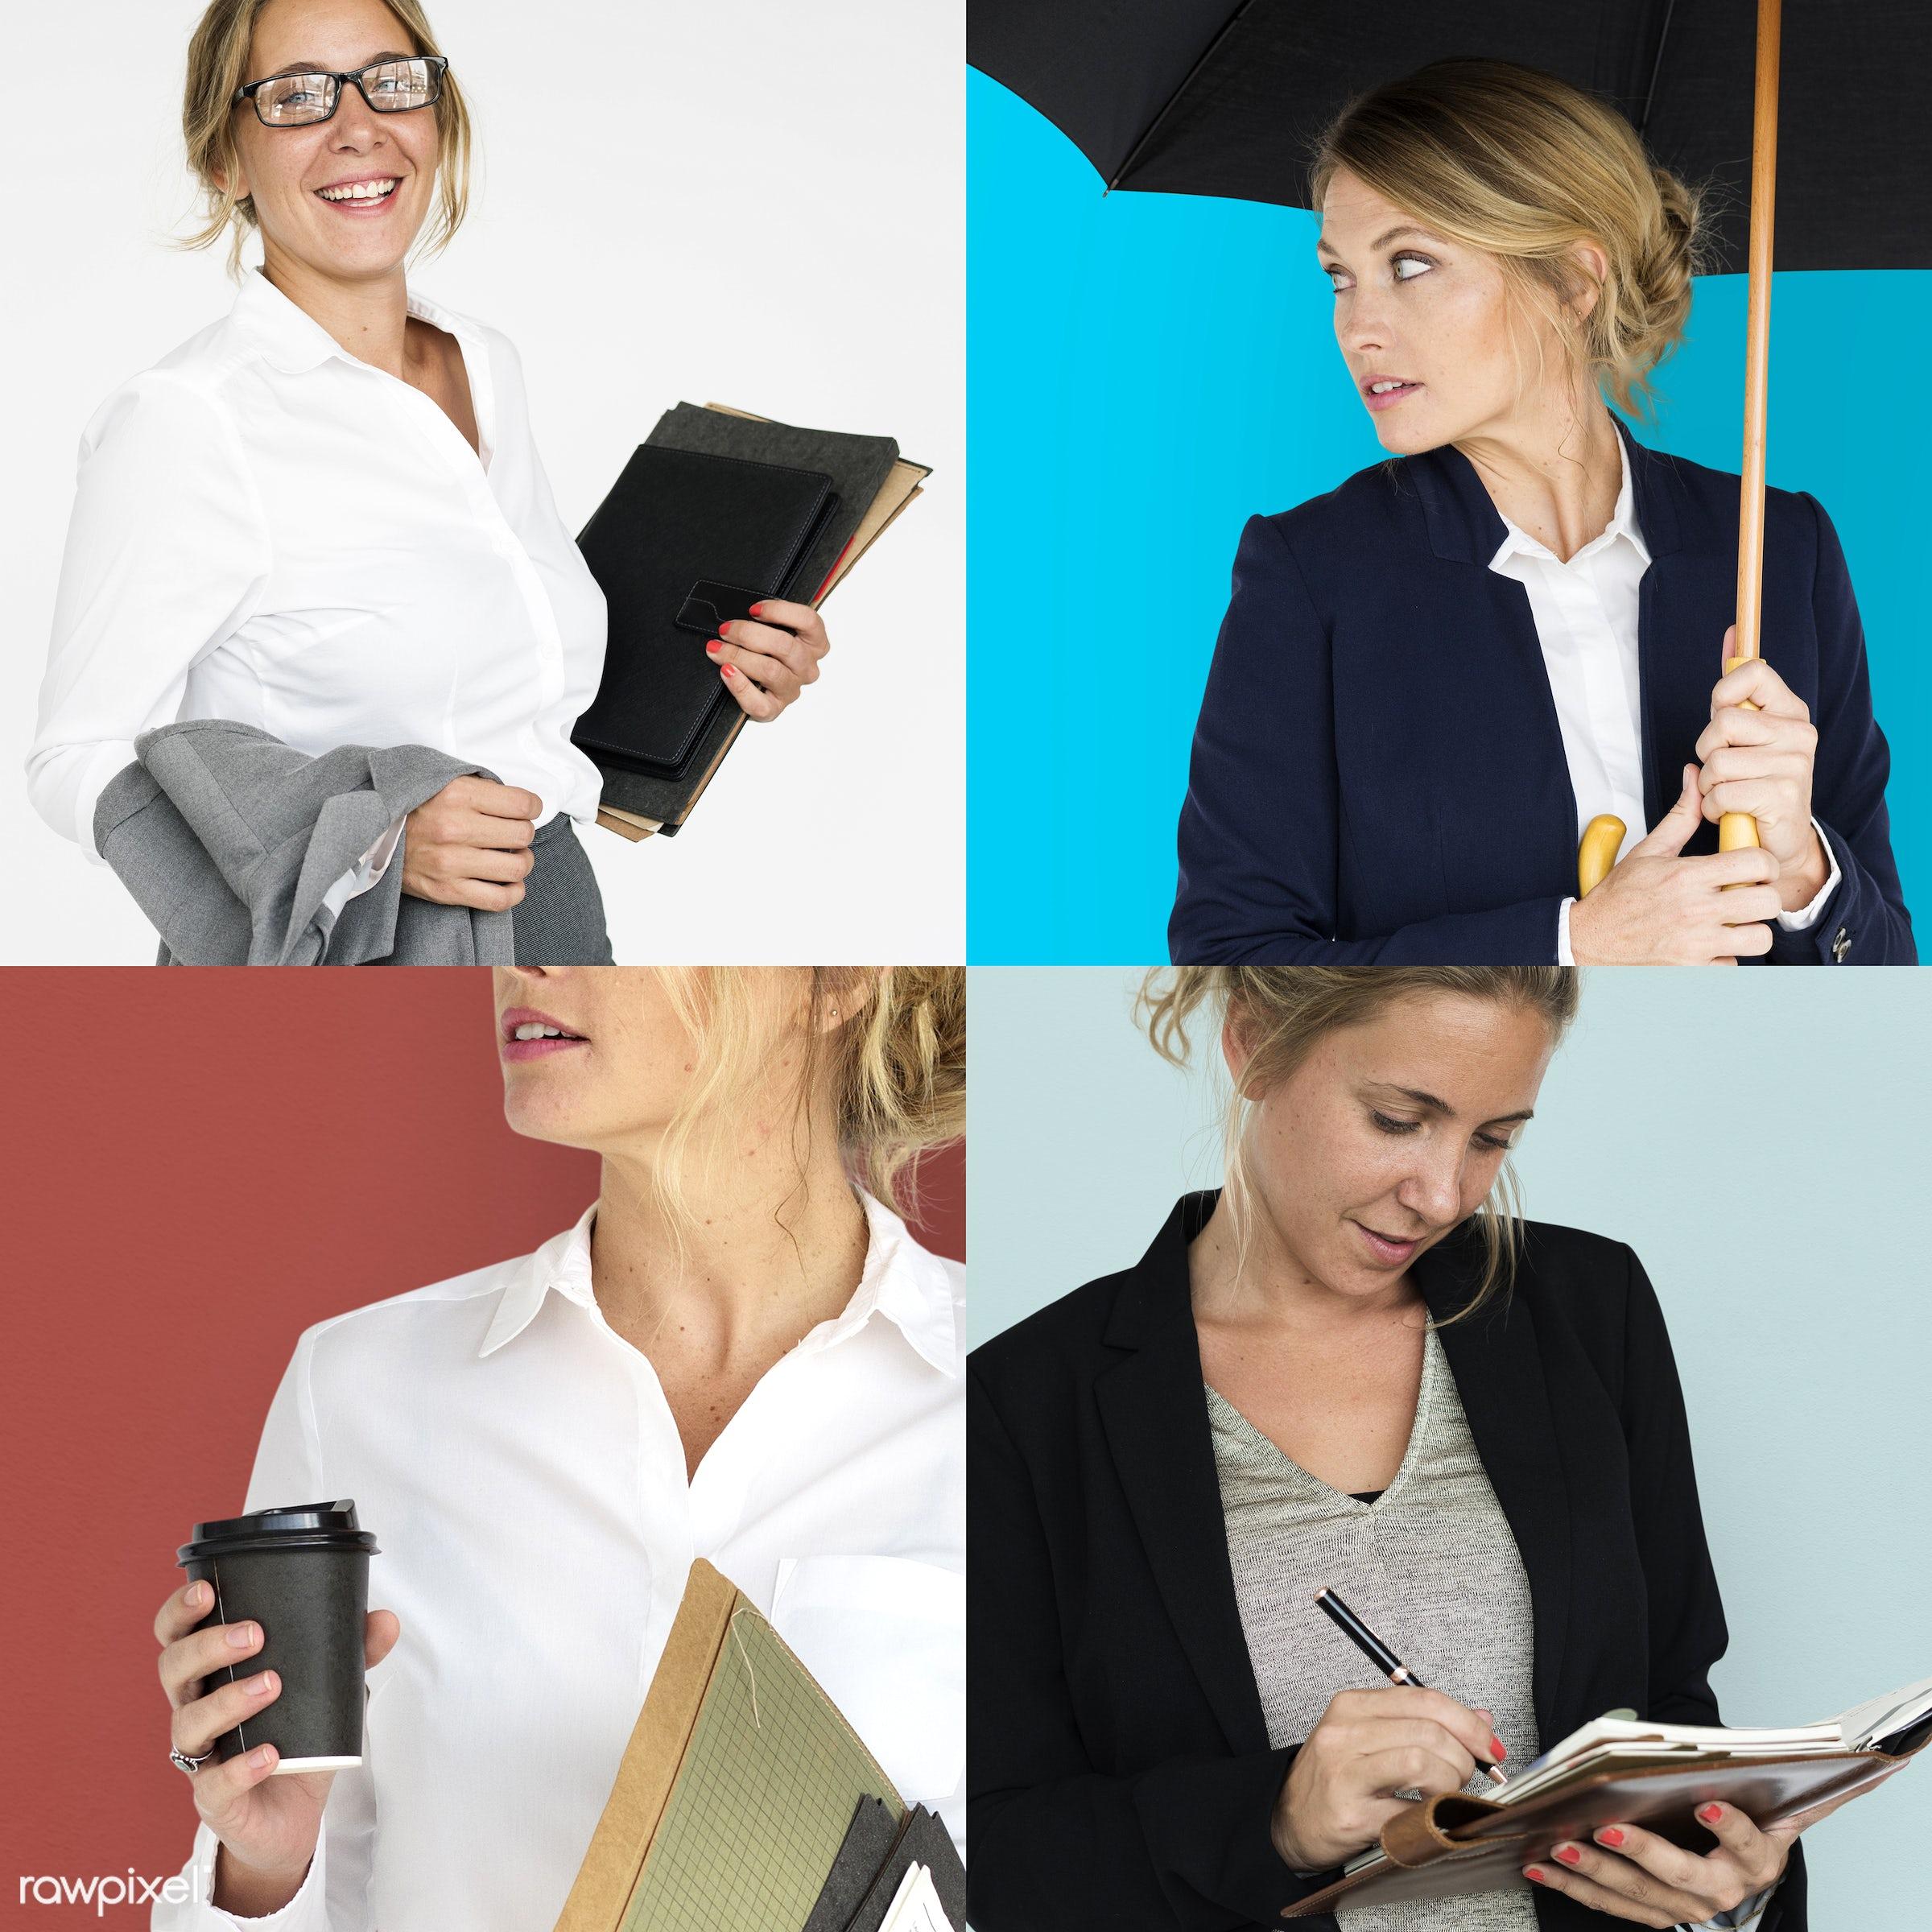 activities, adult, agenda, business, businesswomen, career, casual, cellphone, collage, communicate, communication,...